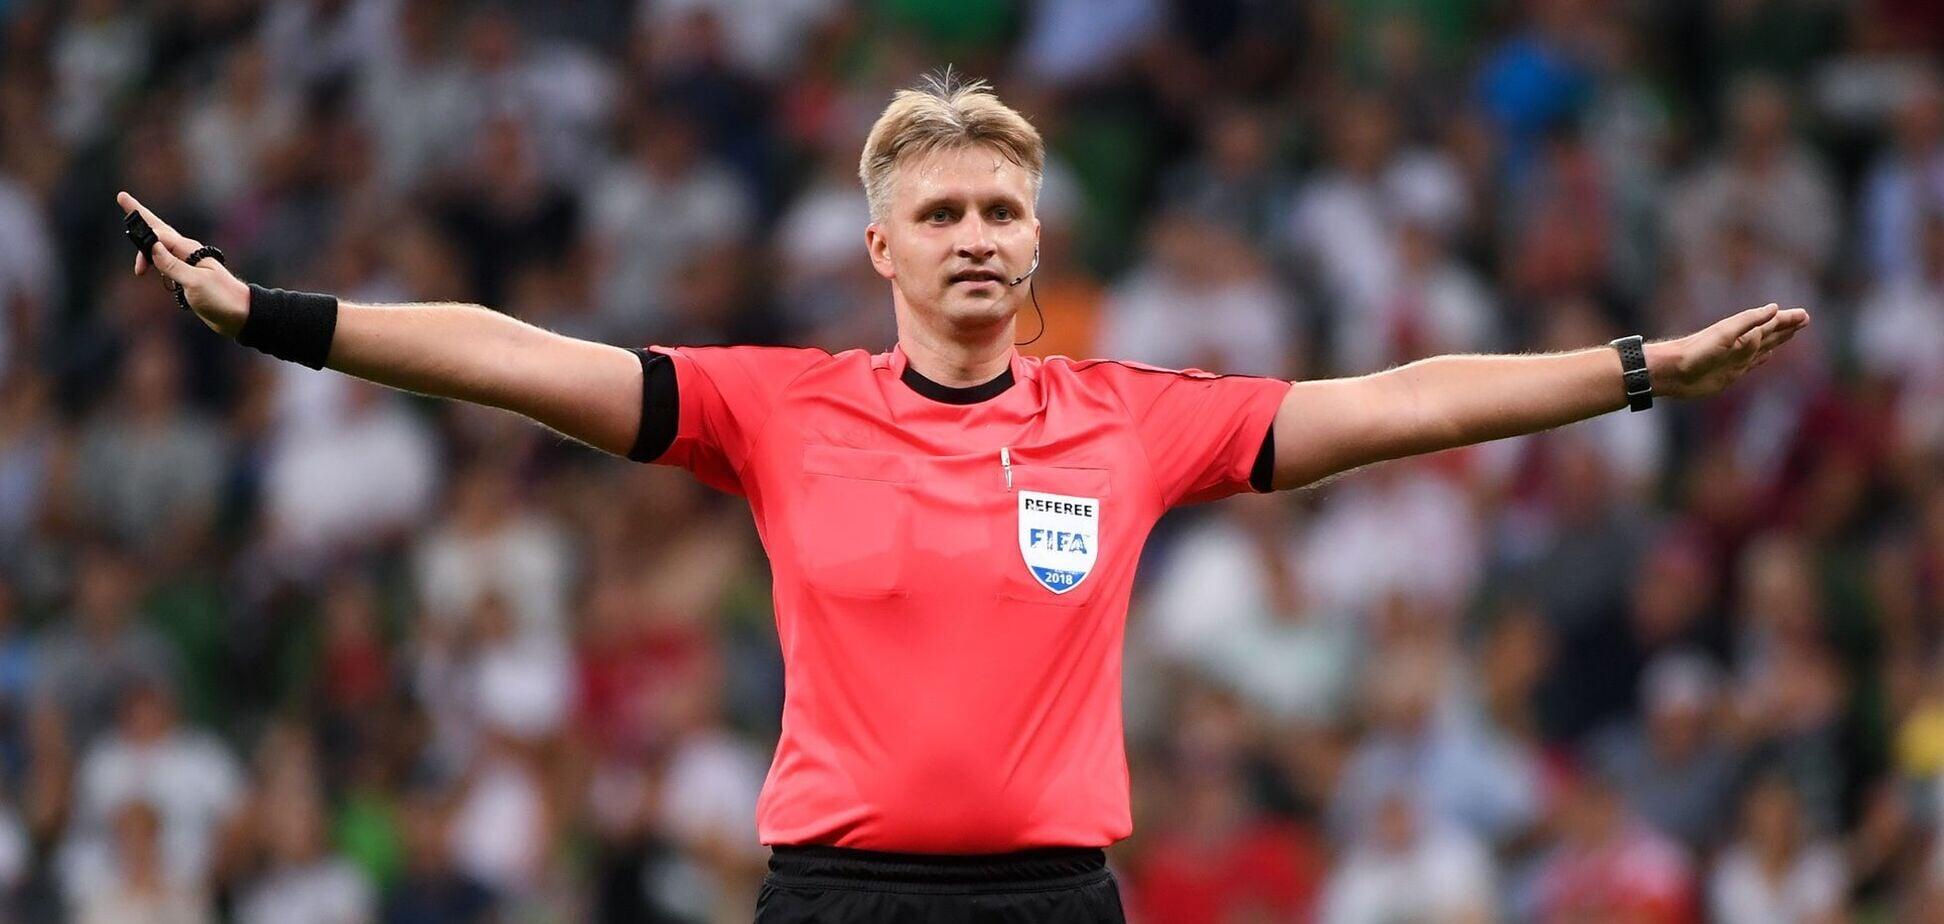 РФС и Лапочкин подадут апелляцию в УЕФА на 10-летнюю дисквалификацию арбитра